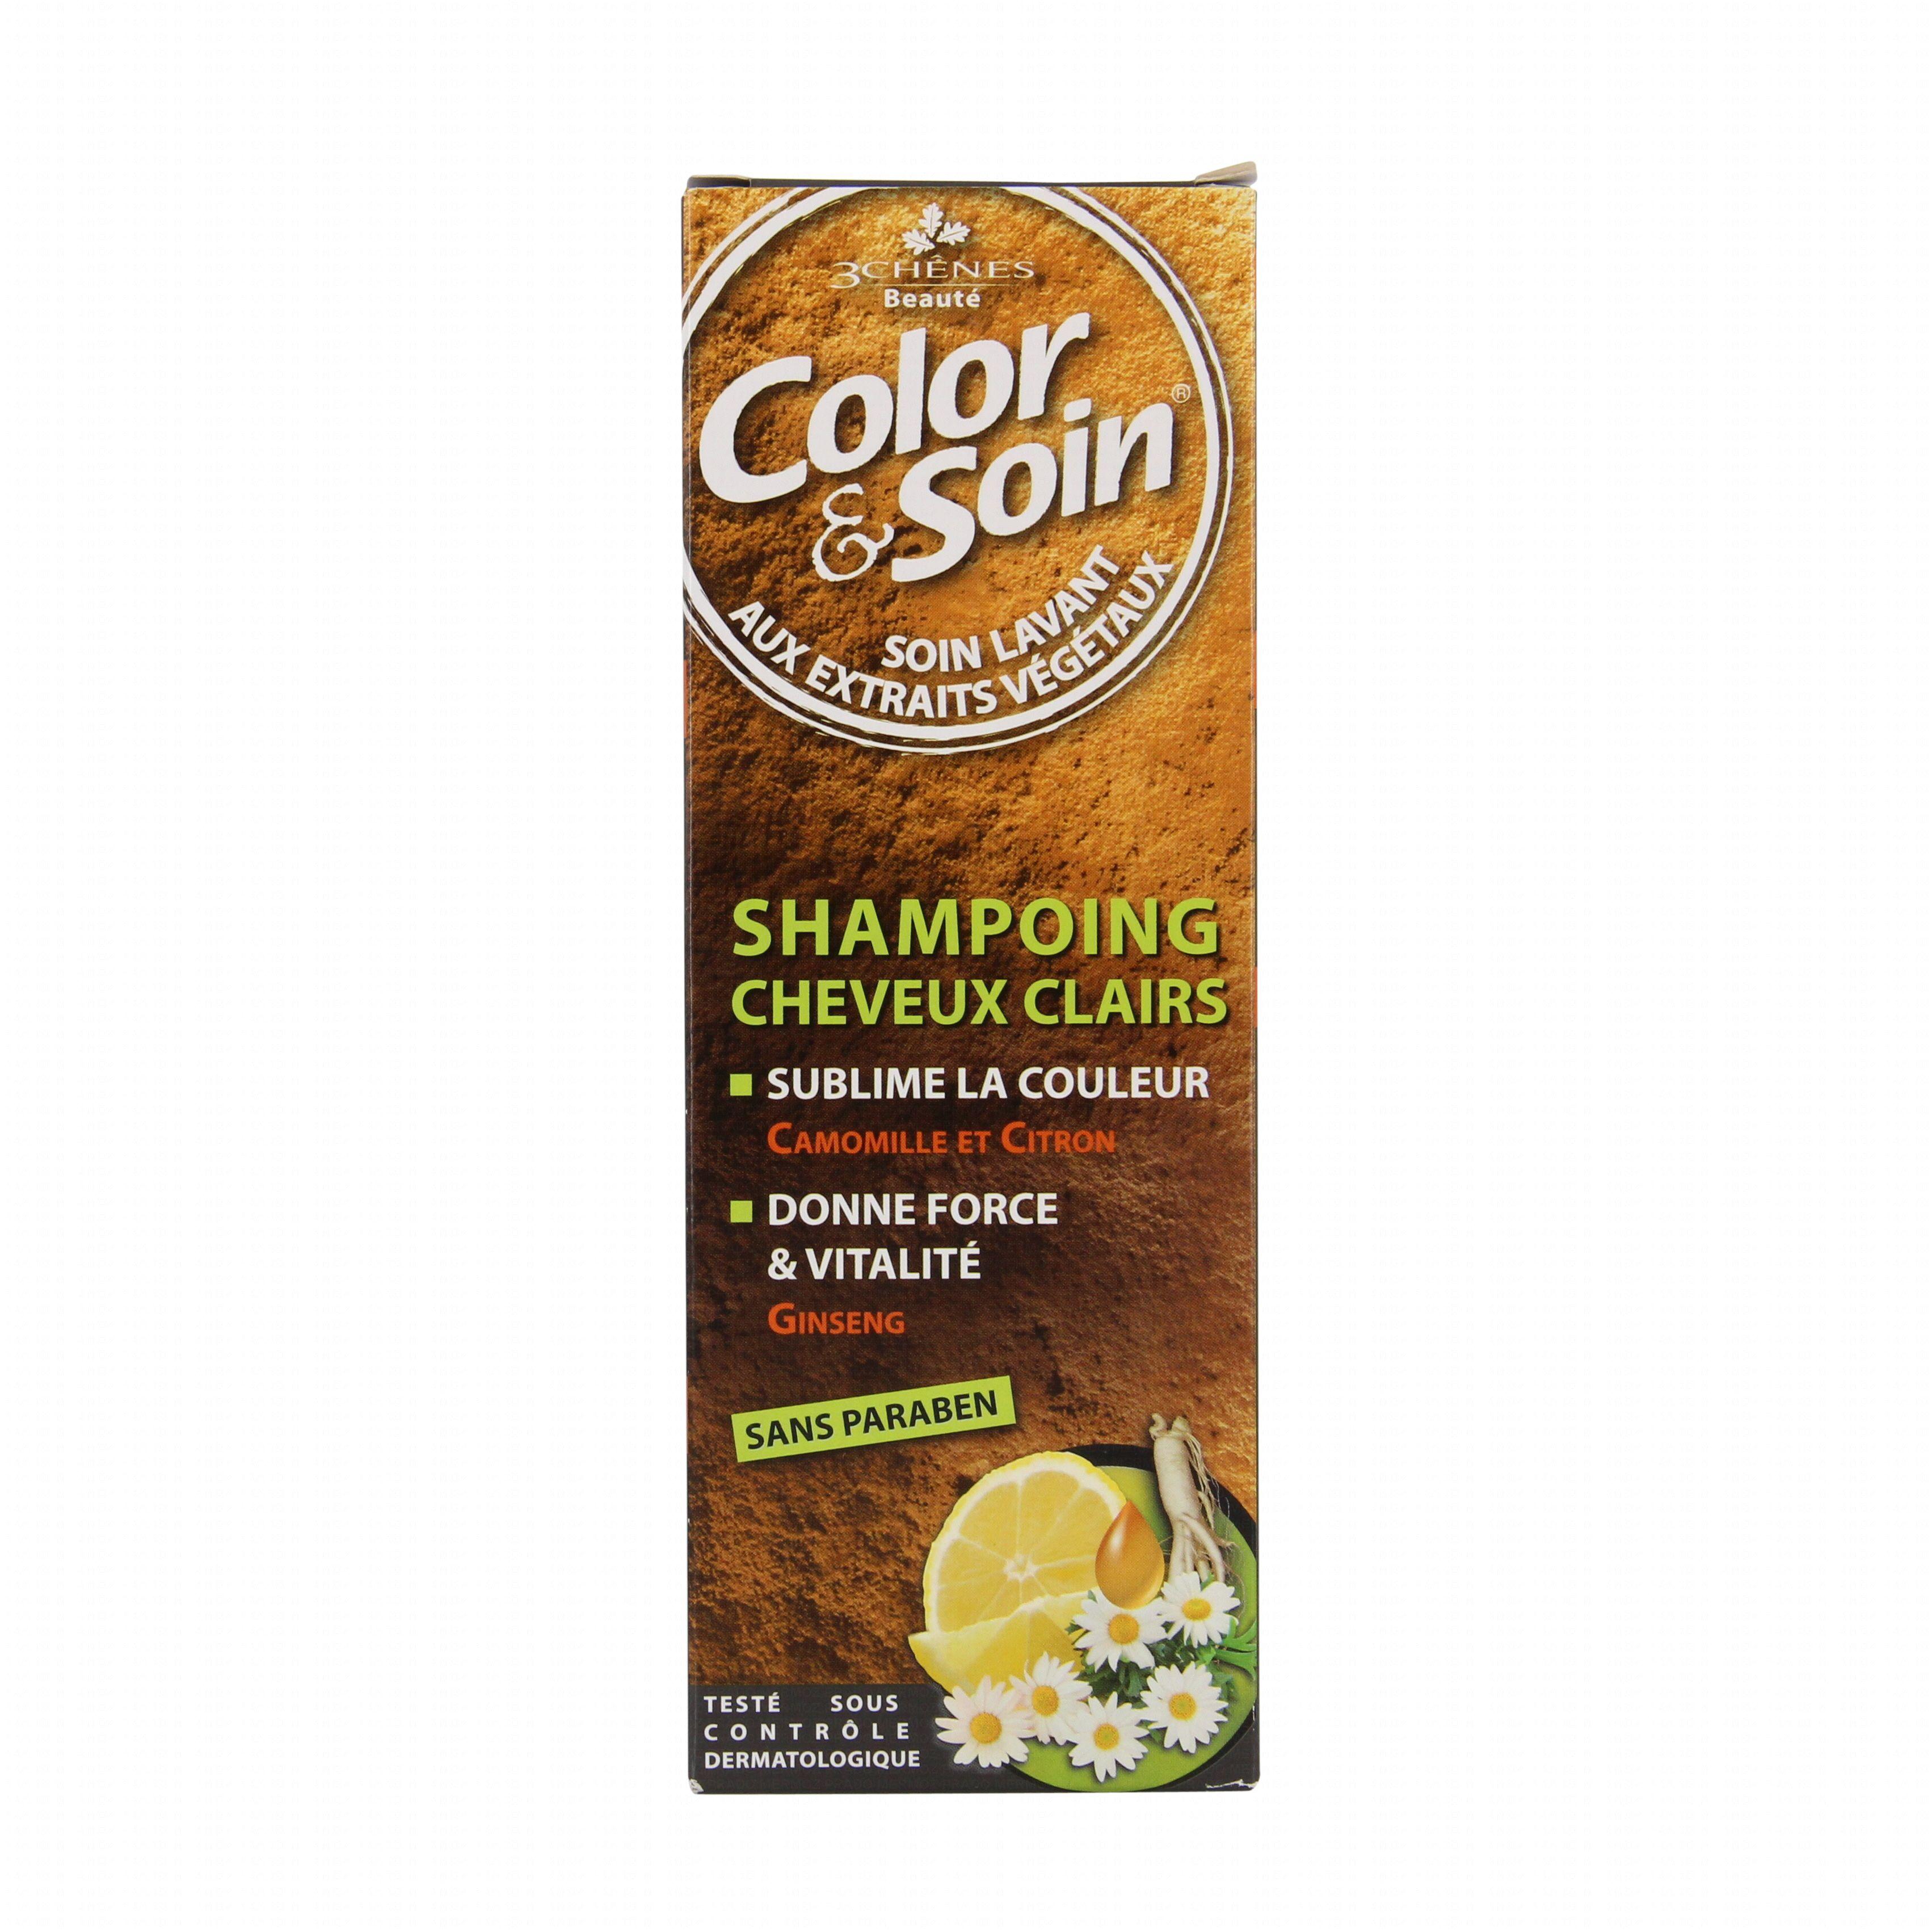 3 chnes color et soin shampooing cheveux clair flacon 250ml illustration n2 - Les 3 Chenes Coloration